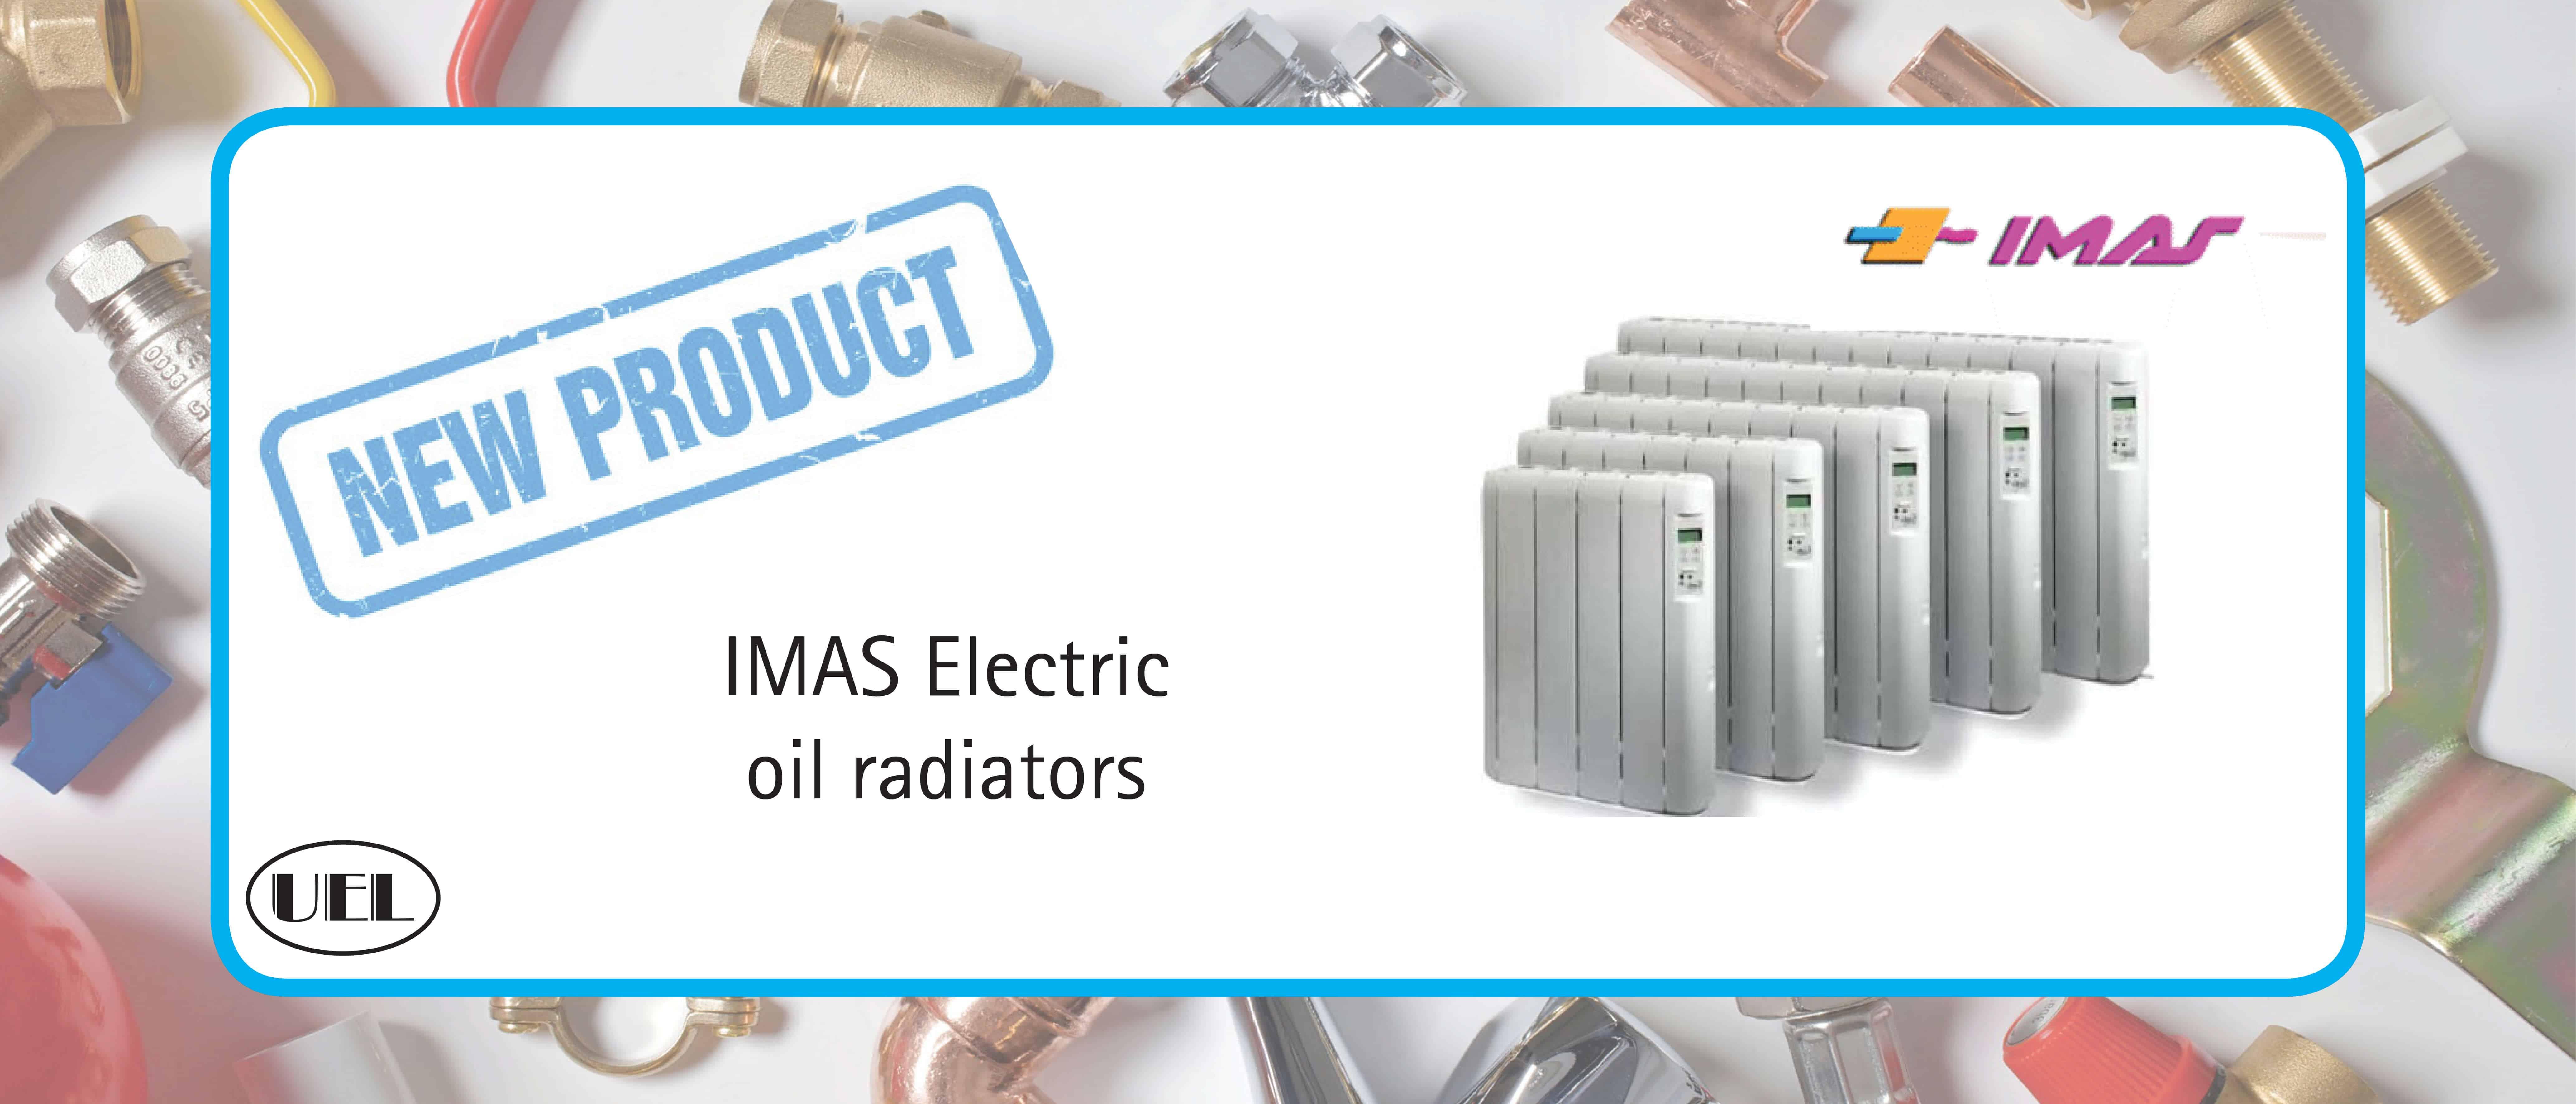 New Product Alert – IMAS Electric Oil Radiators